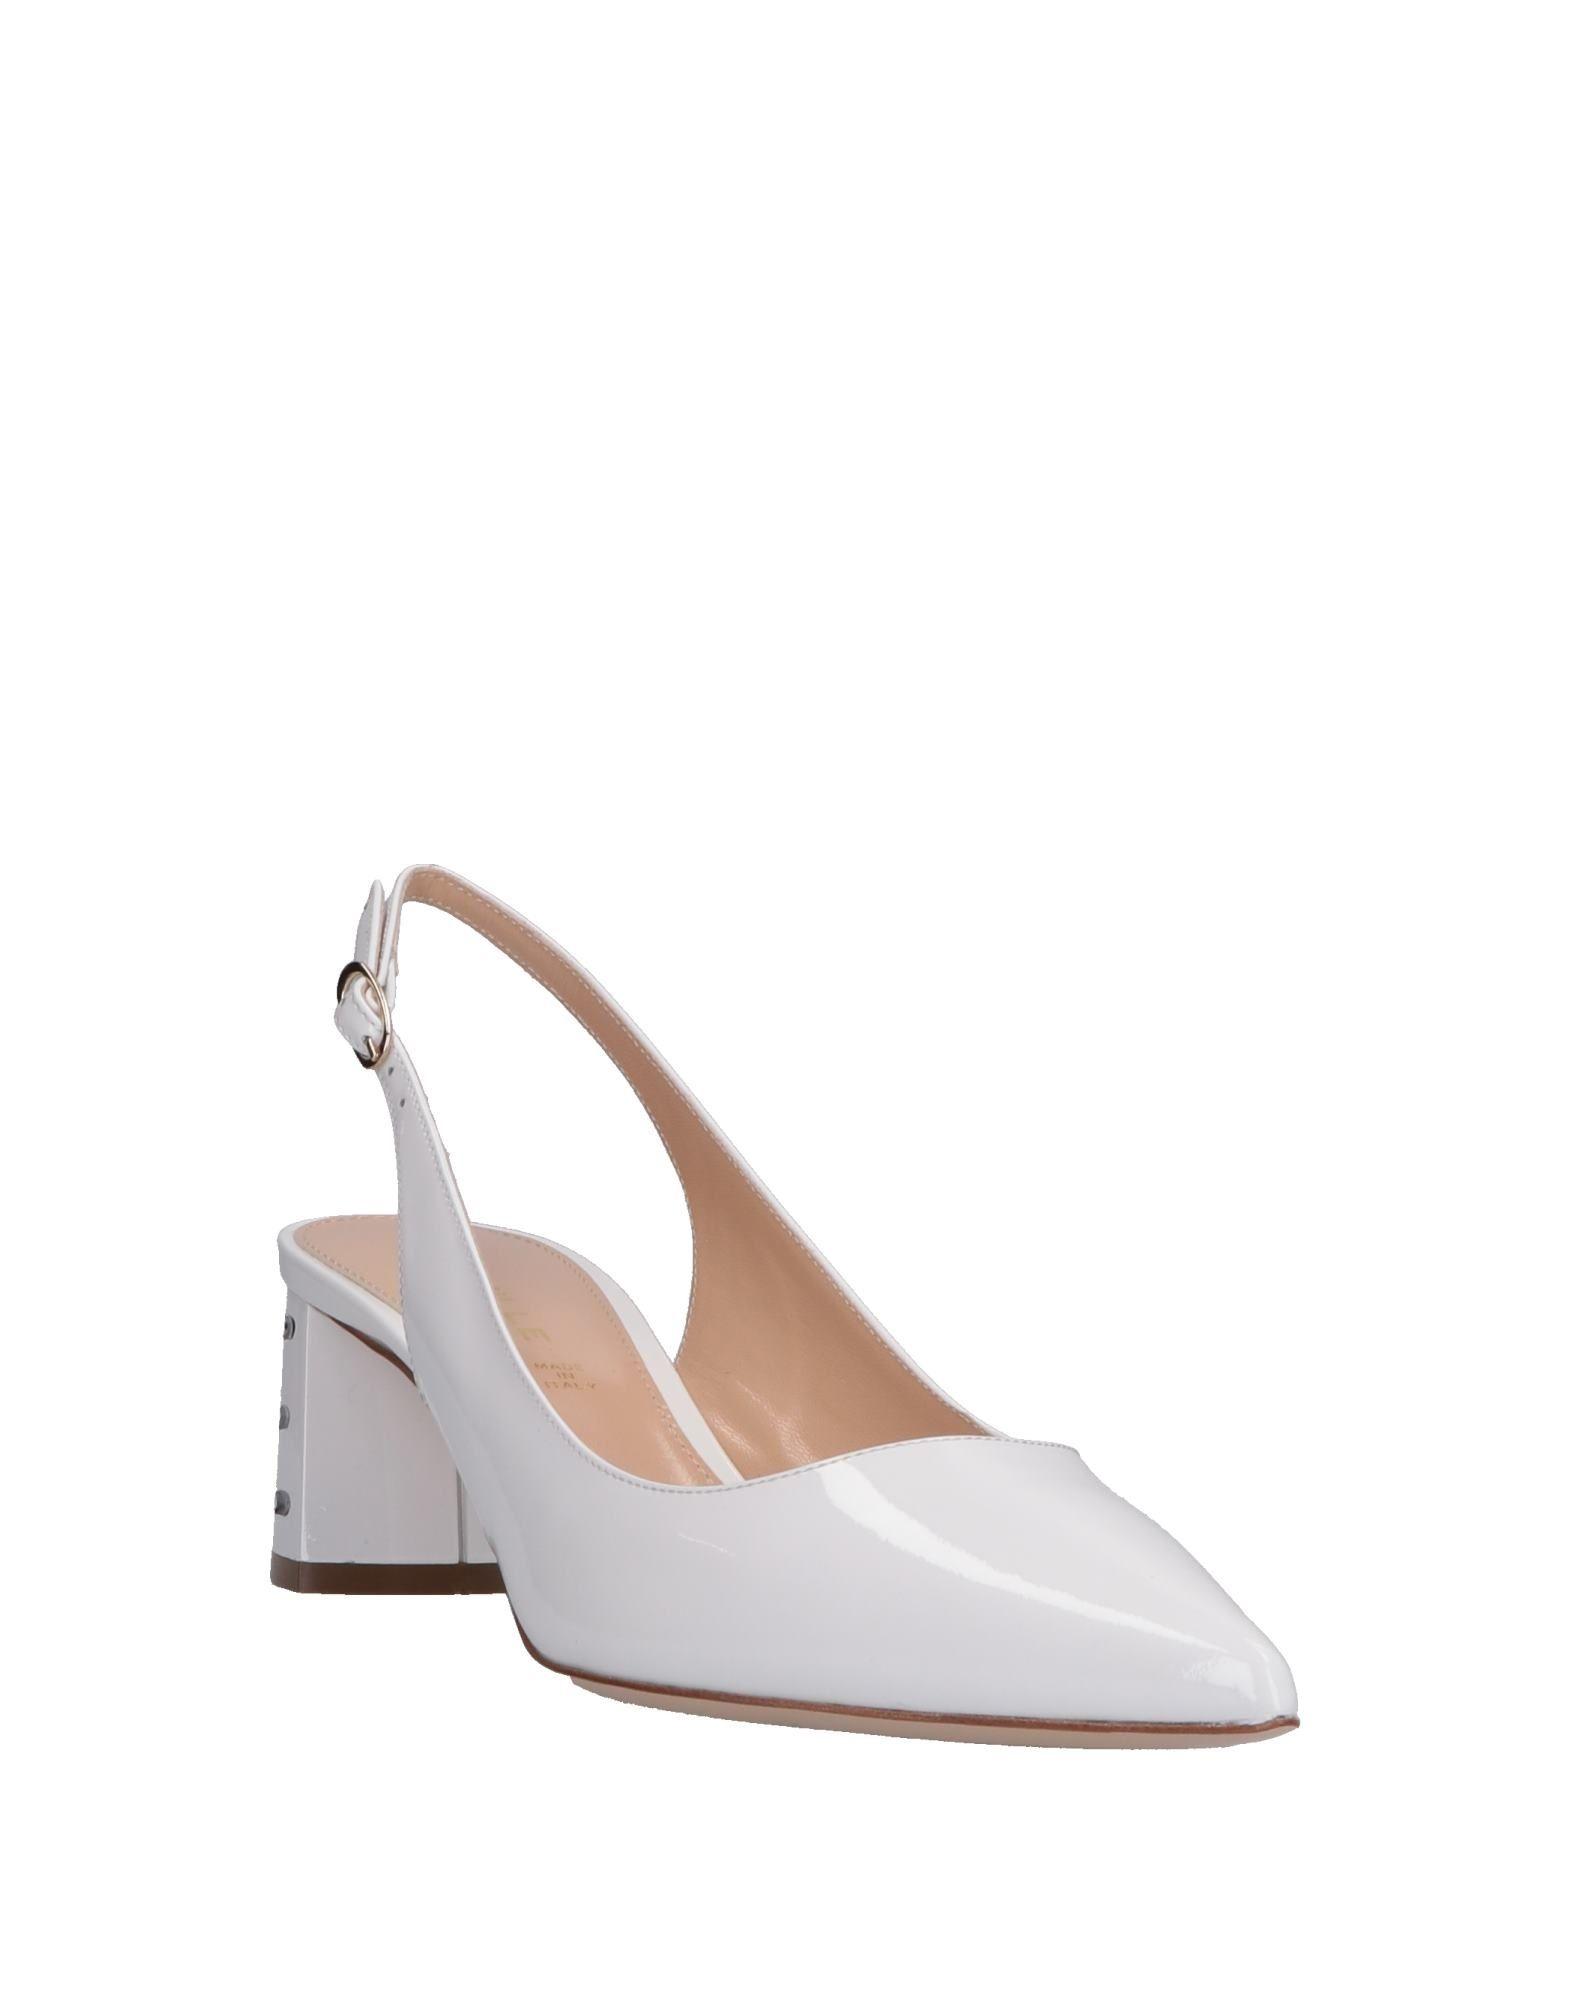 Stilvolle billige Schuhe Deimille Pumps 11562300SE Damen  11562300SE Pumps 01c784